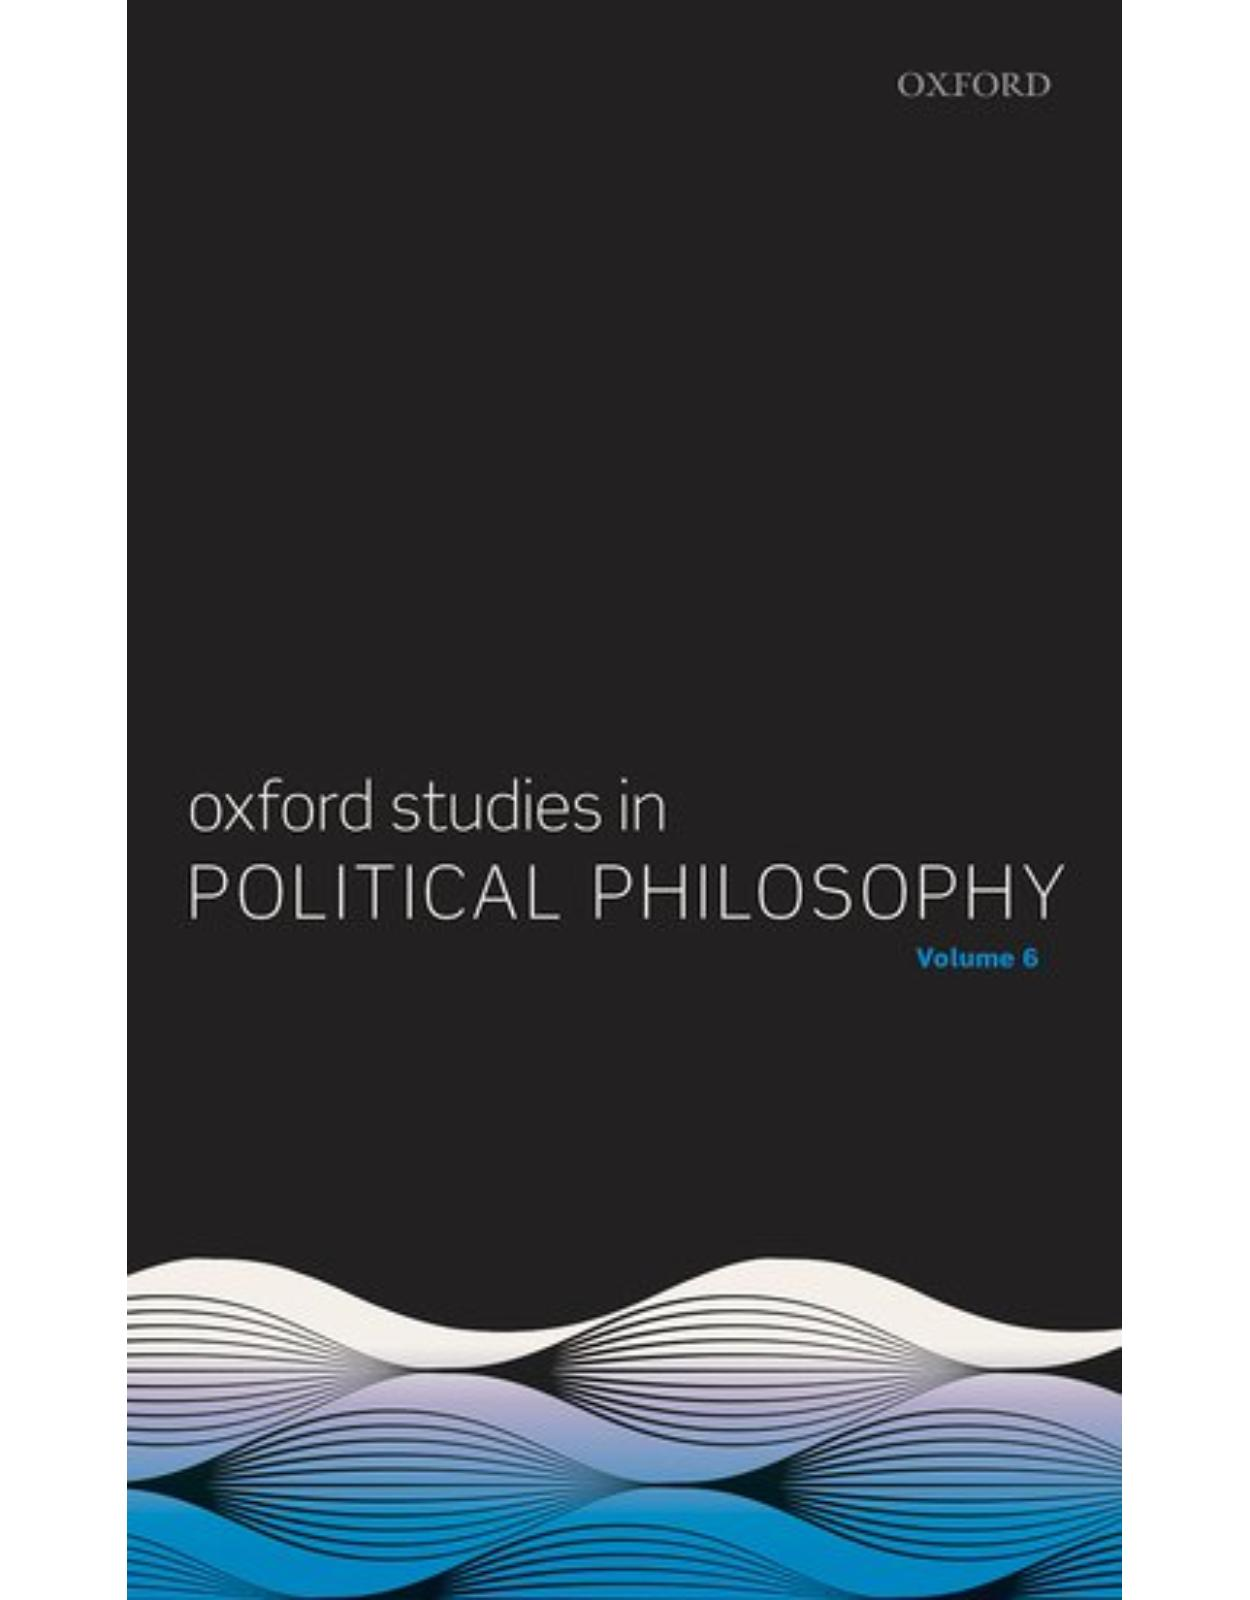 Oxford Studies in Political Philosophy Volume 6